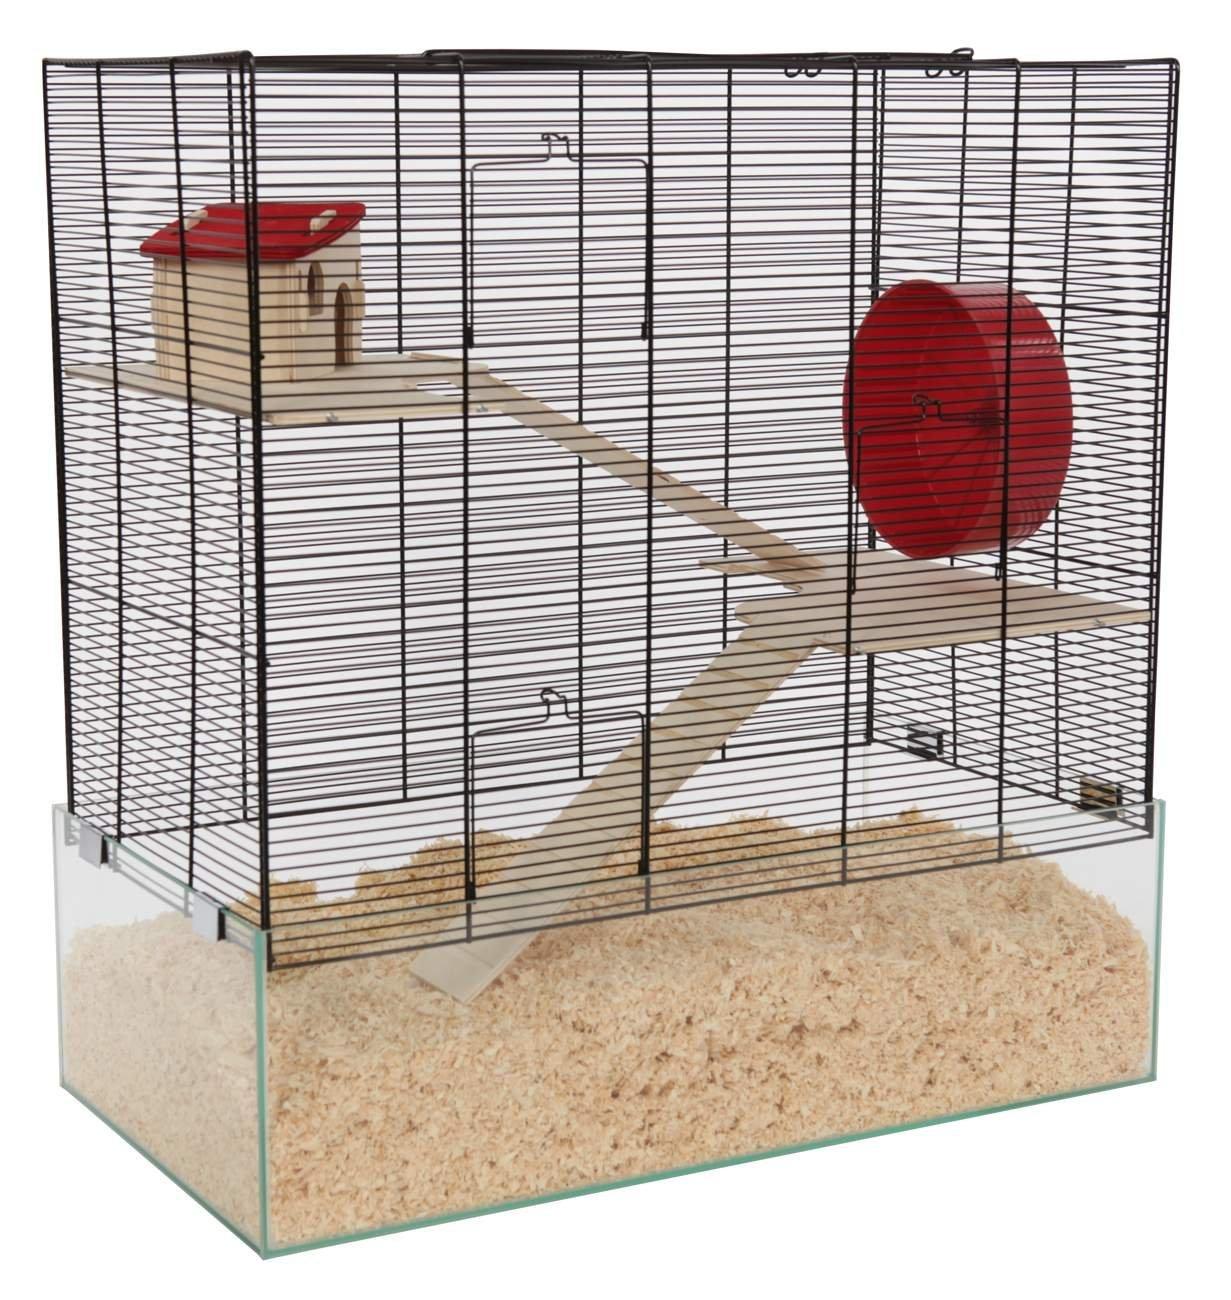 Hamsterkäfig Vergleich Platz 6 Gitterkäfig mit Glasboden